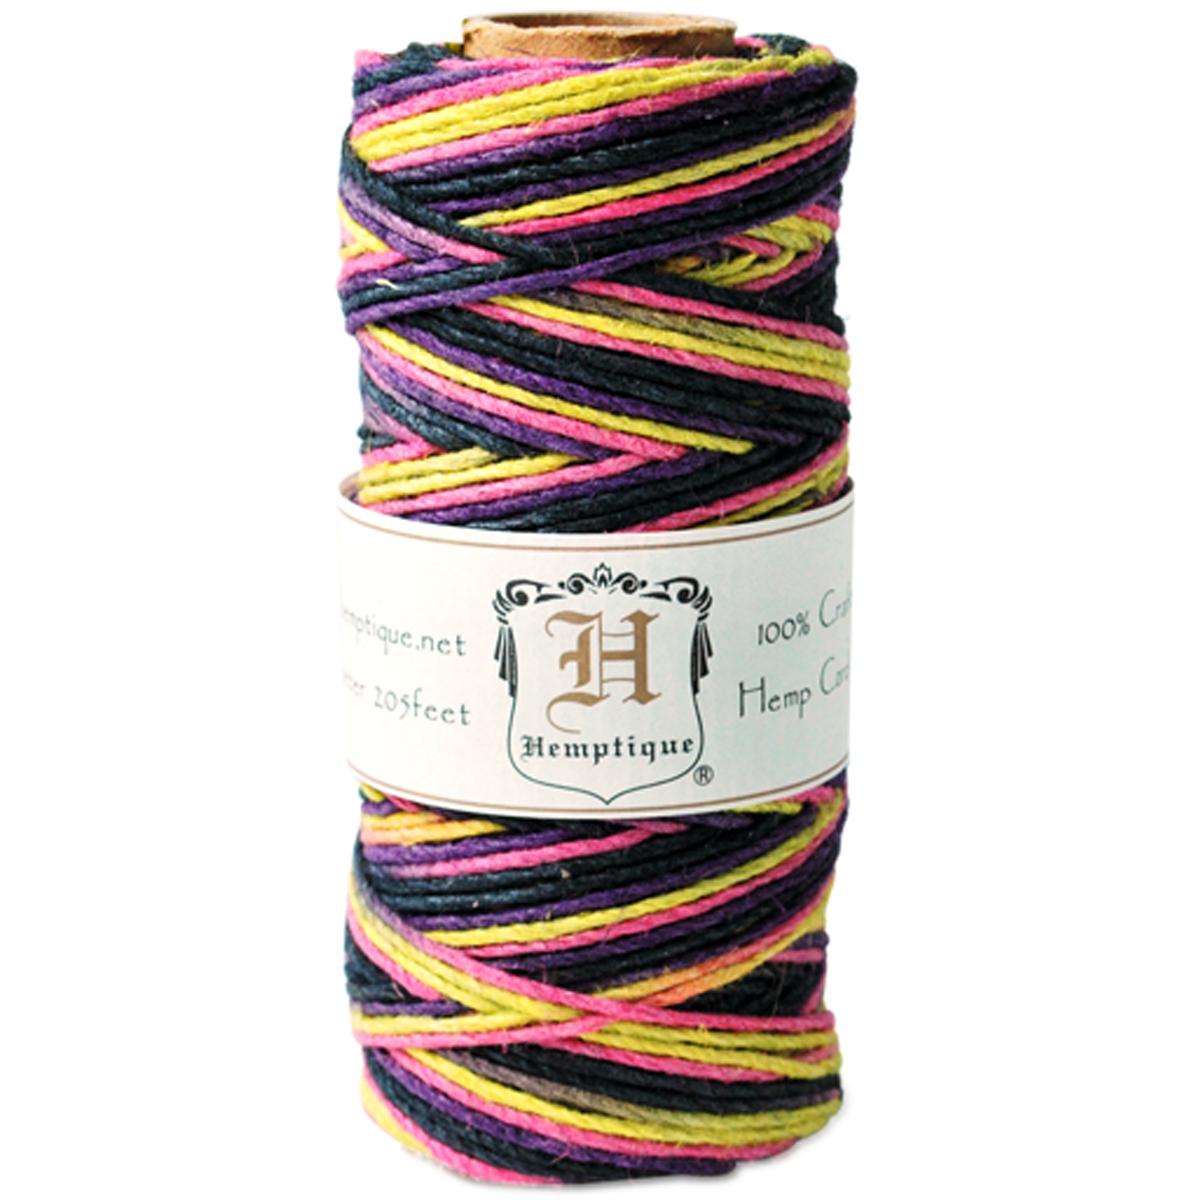 Hemptique Hemp Variegated Cord Spool 20lb 205'-Earthy